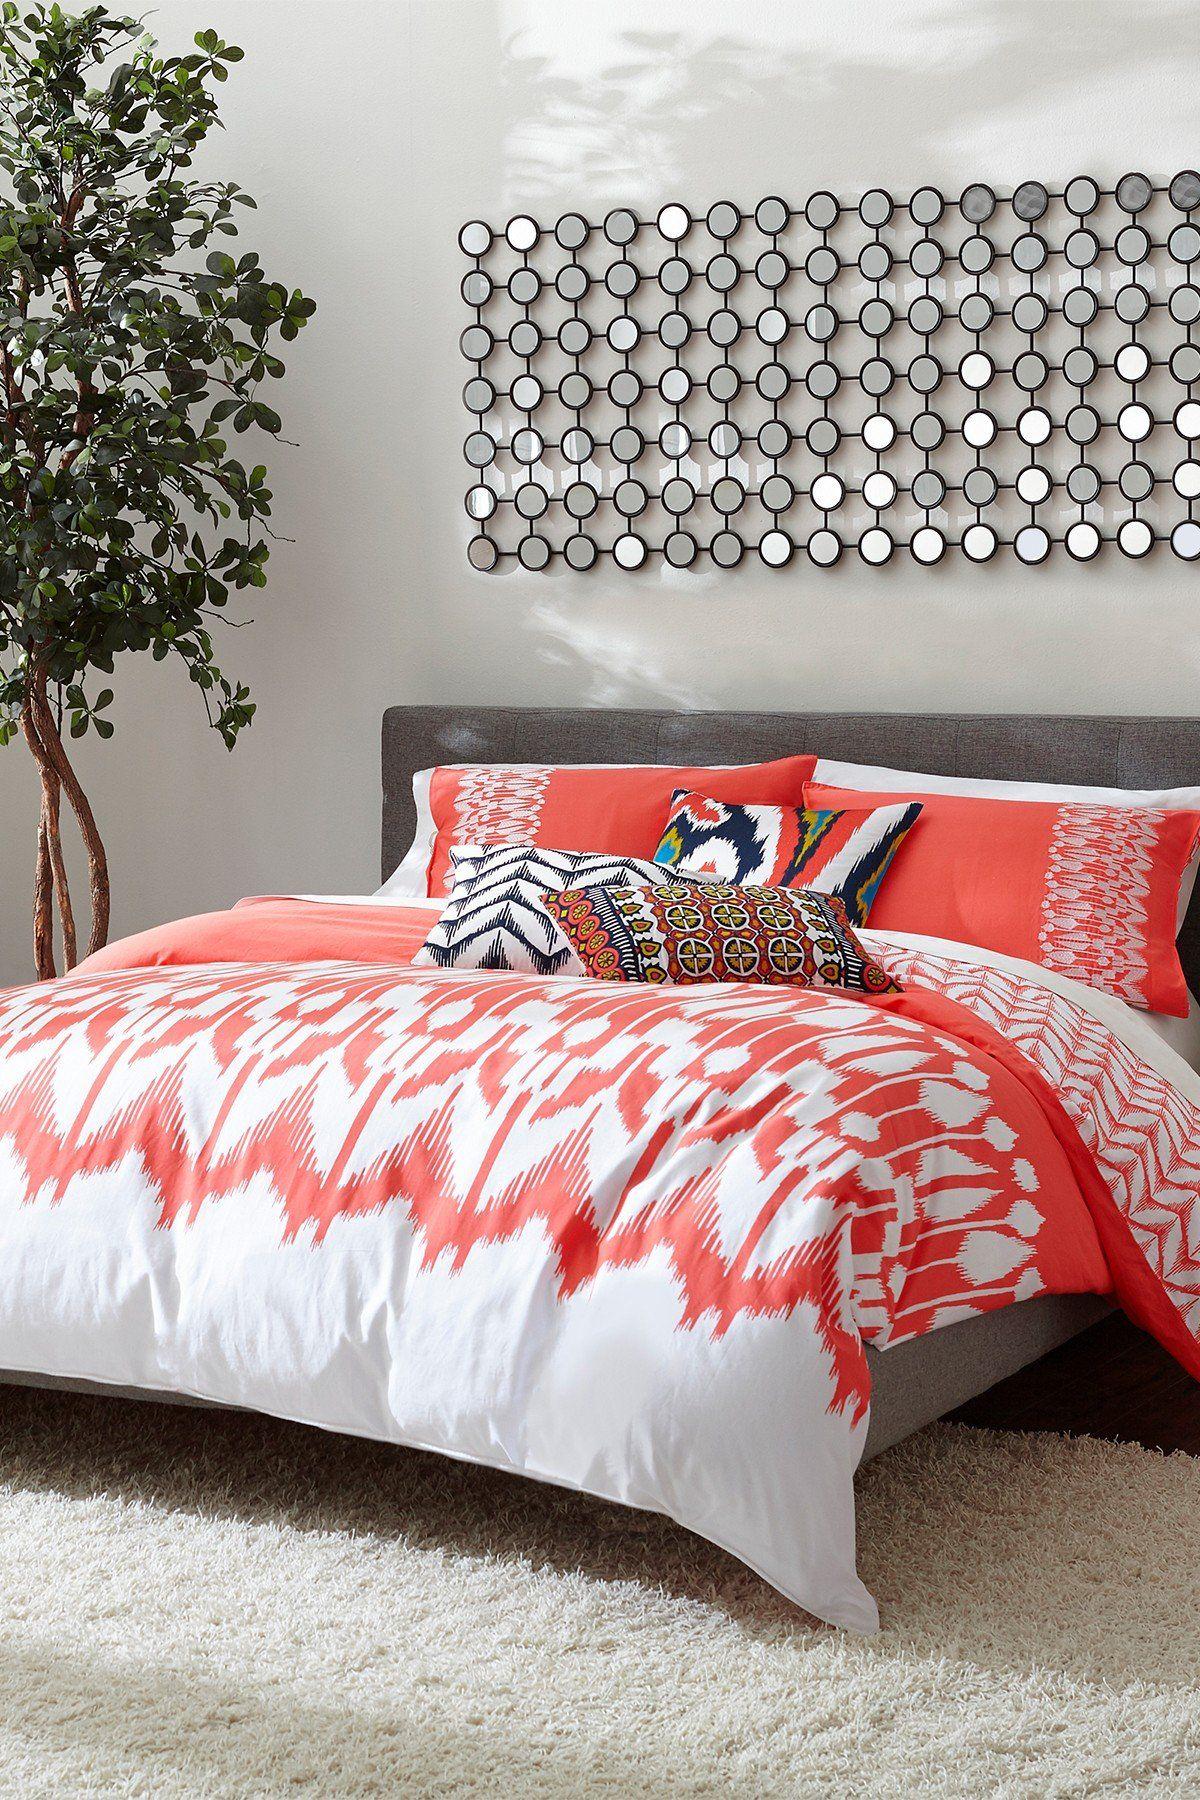 Hollyhock Ikat Comforter & Sham Set Coral/White Trina